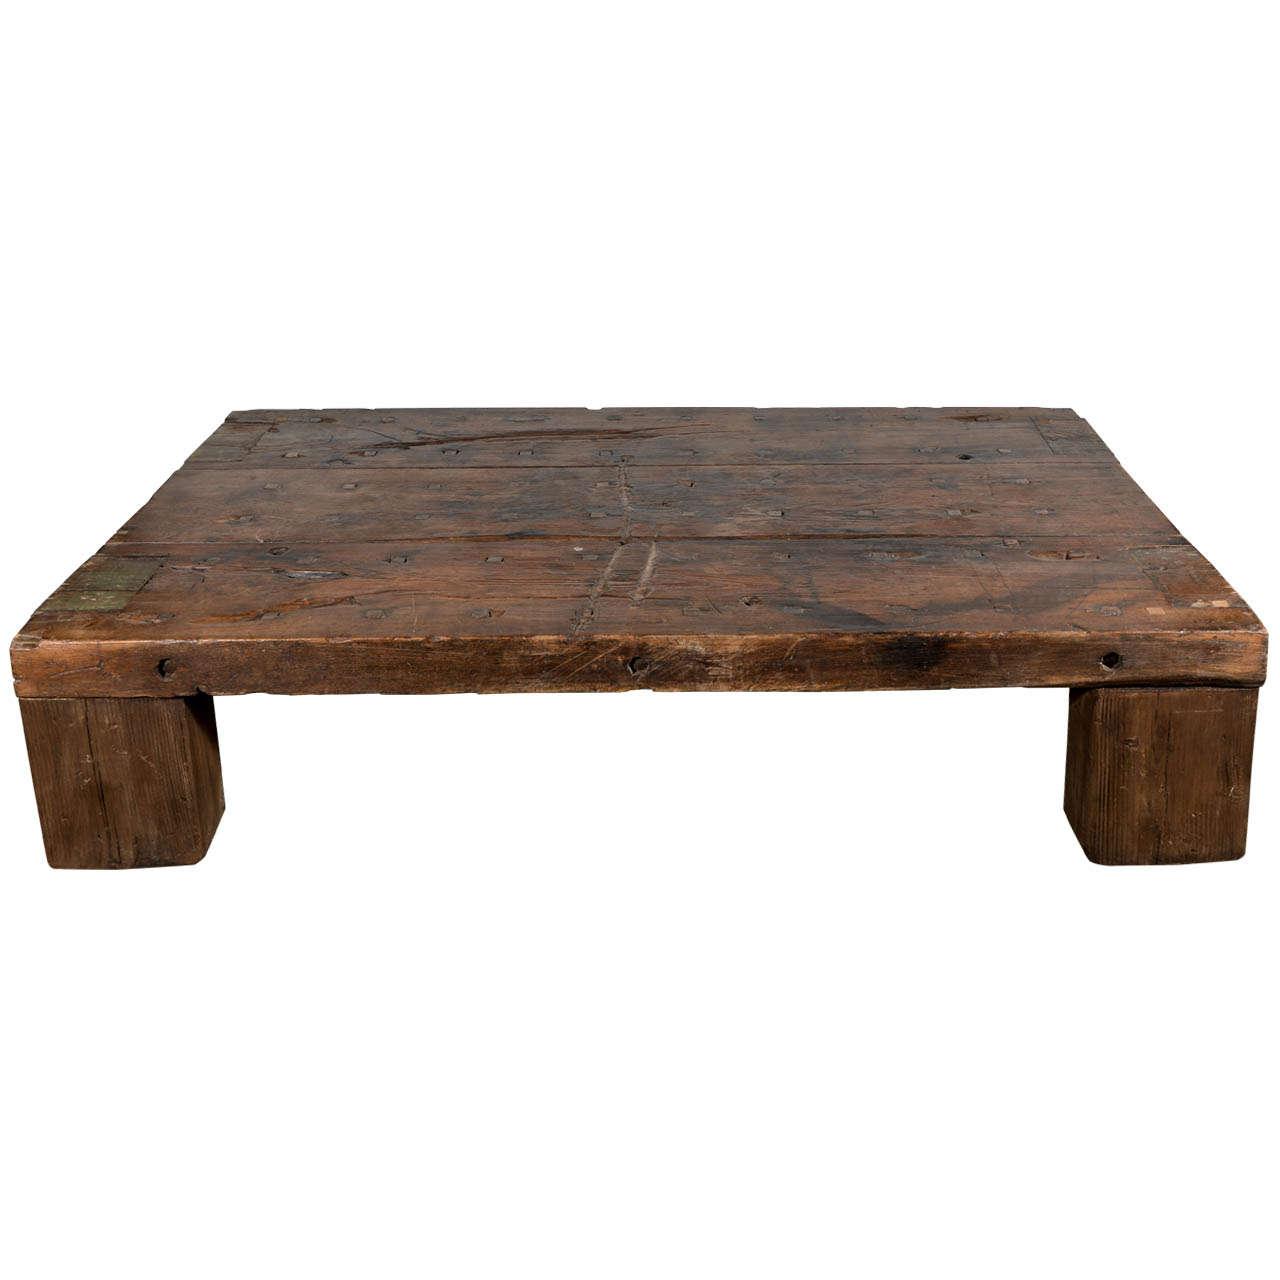 Primitive Oak Coffee Table At 1stdibs